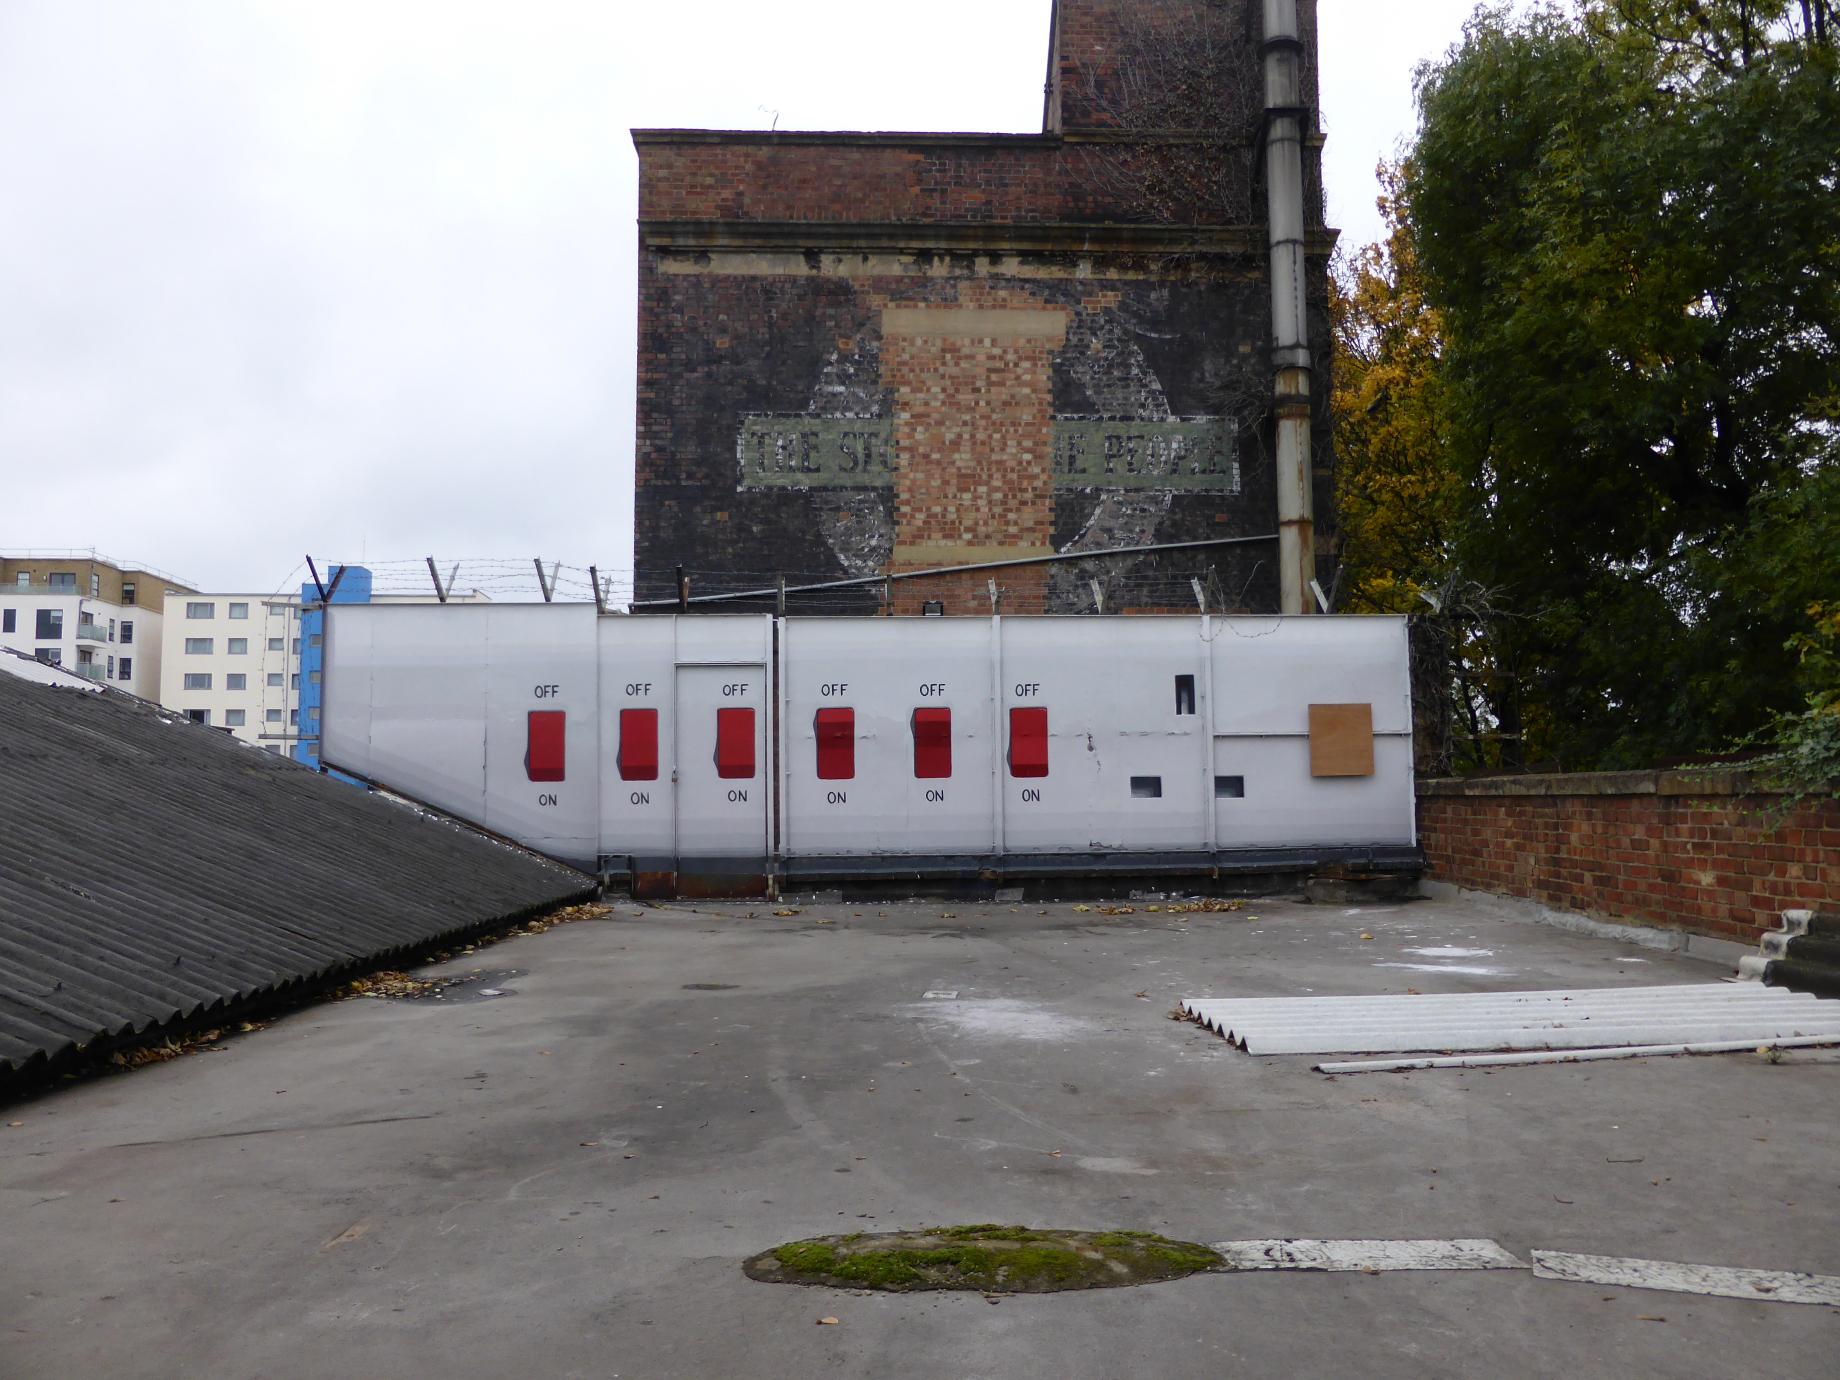 fresque-geante-objet-quotidien-street-art-08